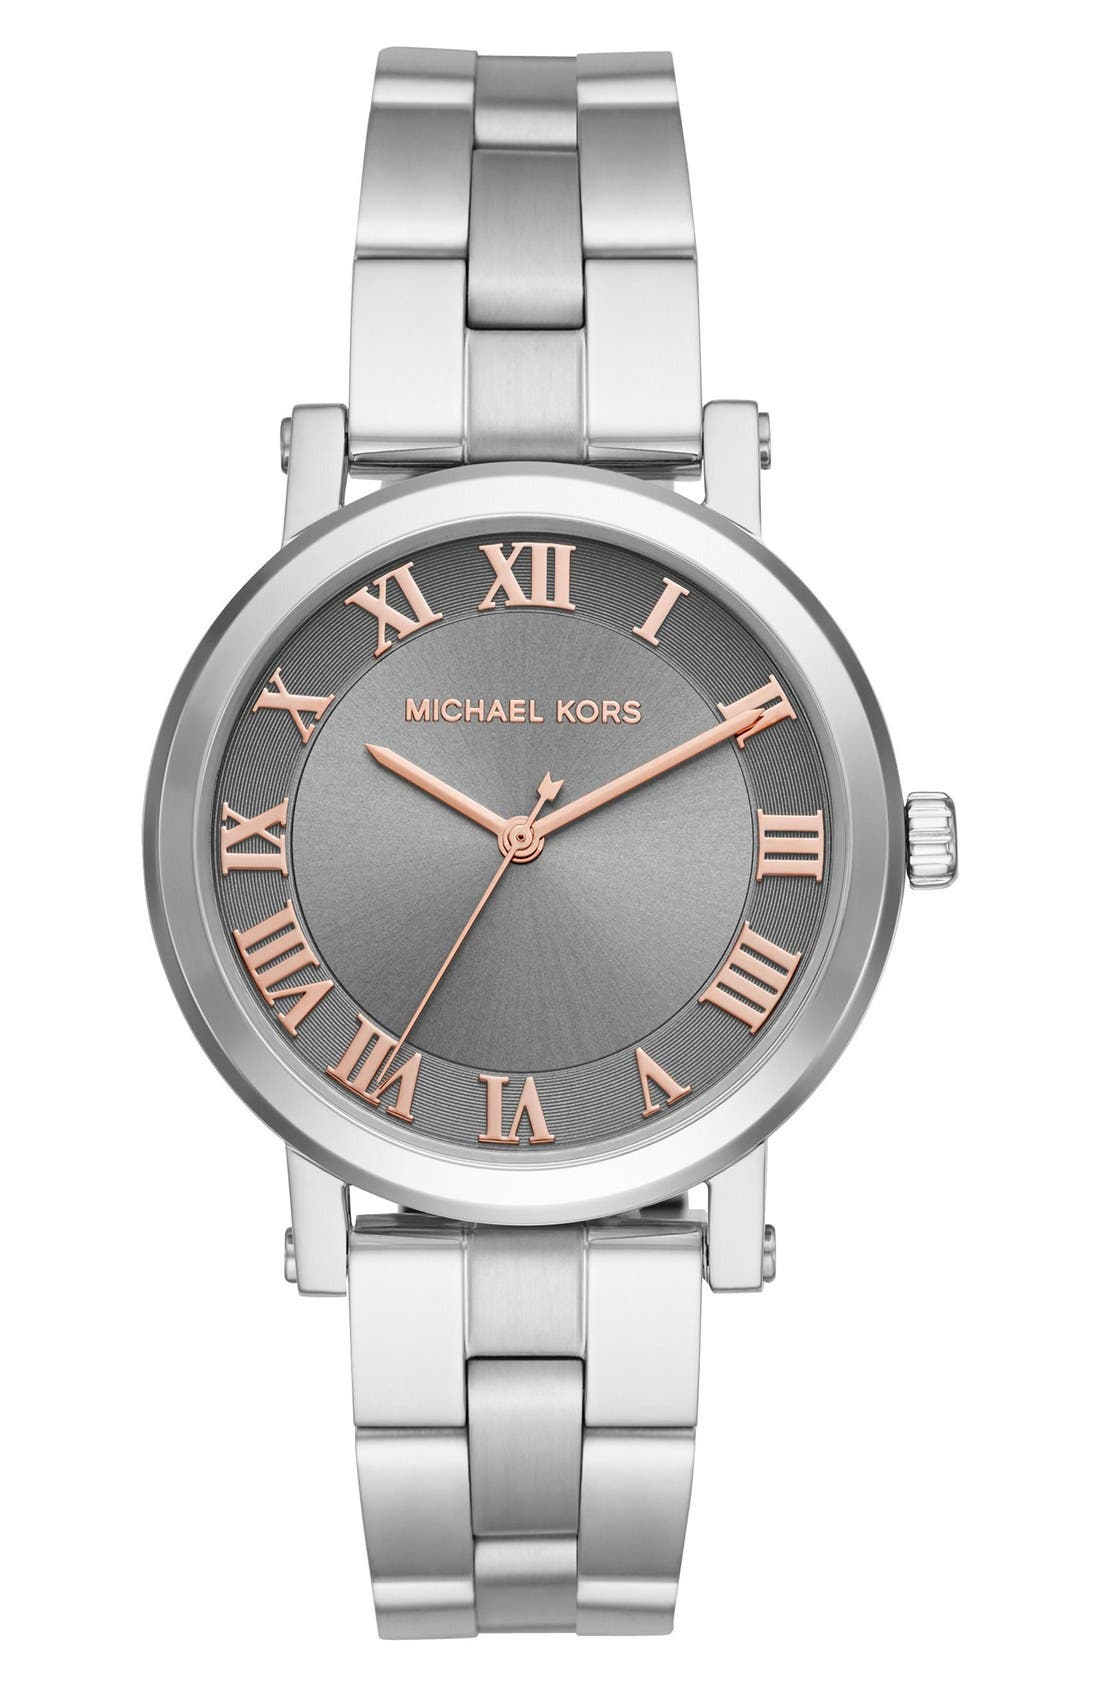 Main Image - Michael Kors 'Norie' Bracelet Watch, 38mm